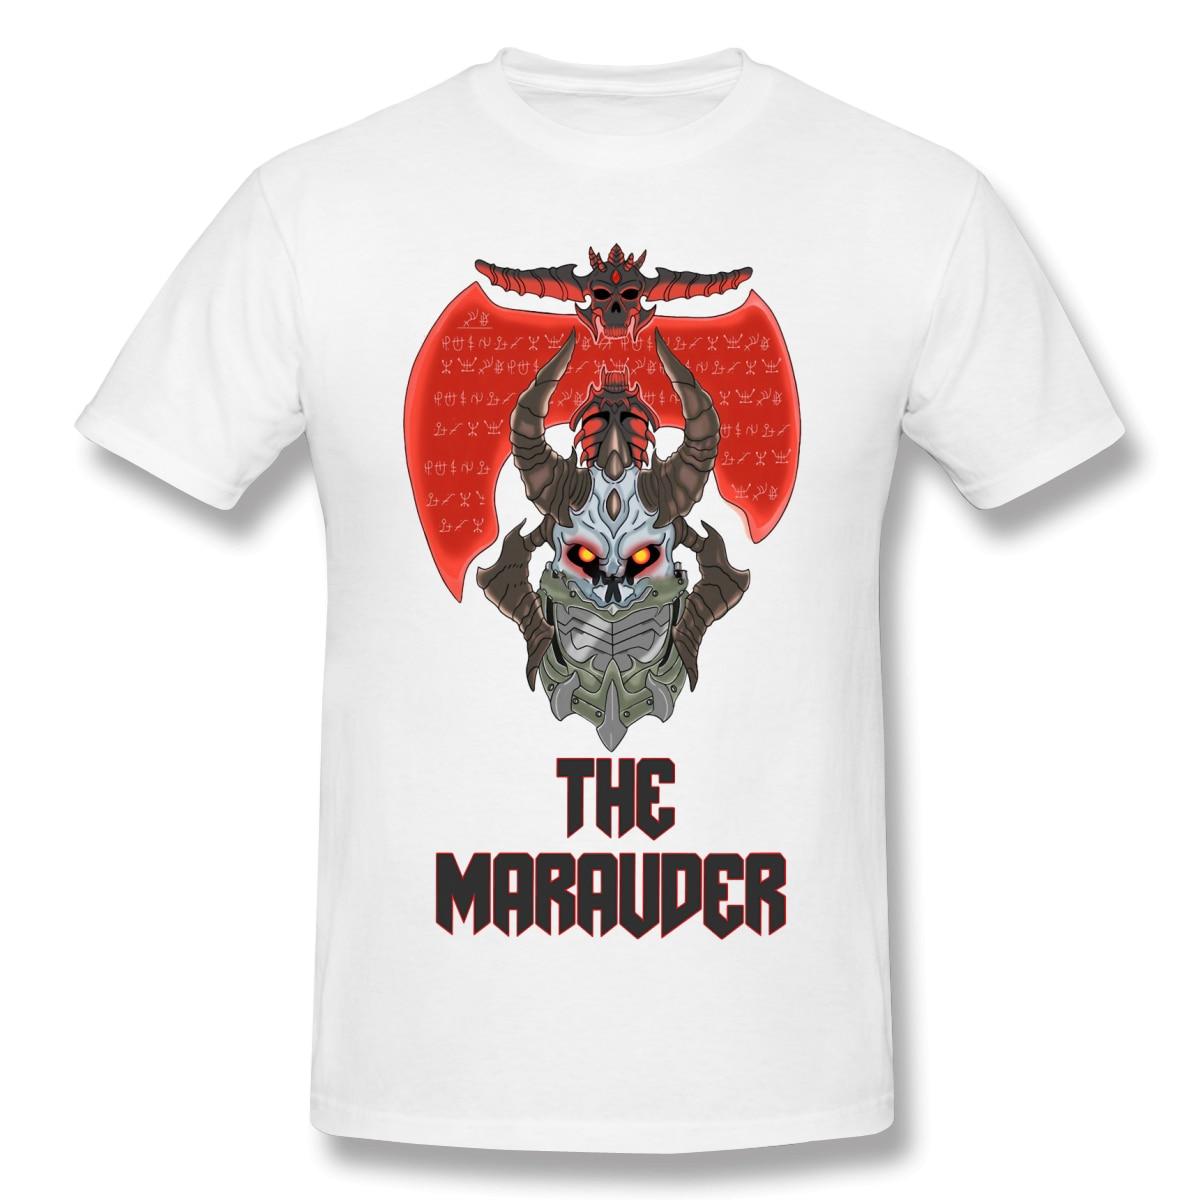 Camiseta de hombre The Marauder 100% diseño de algodón manga corta de verano doom eternal camiseta divertida suelta